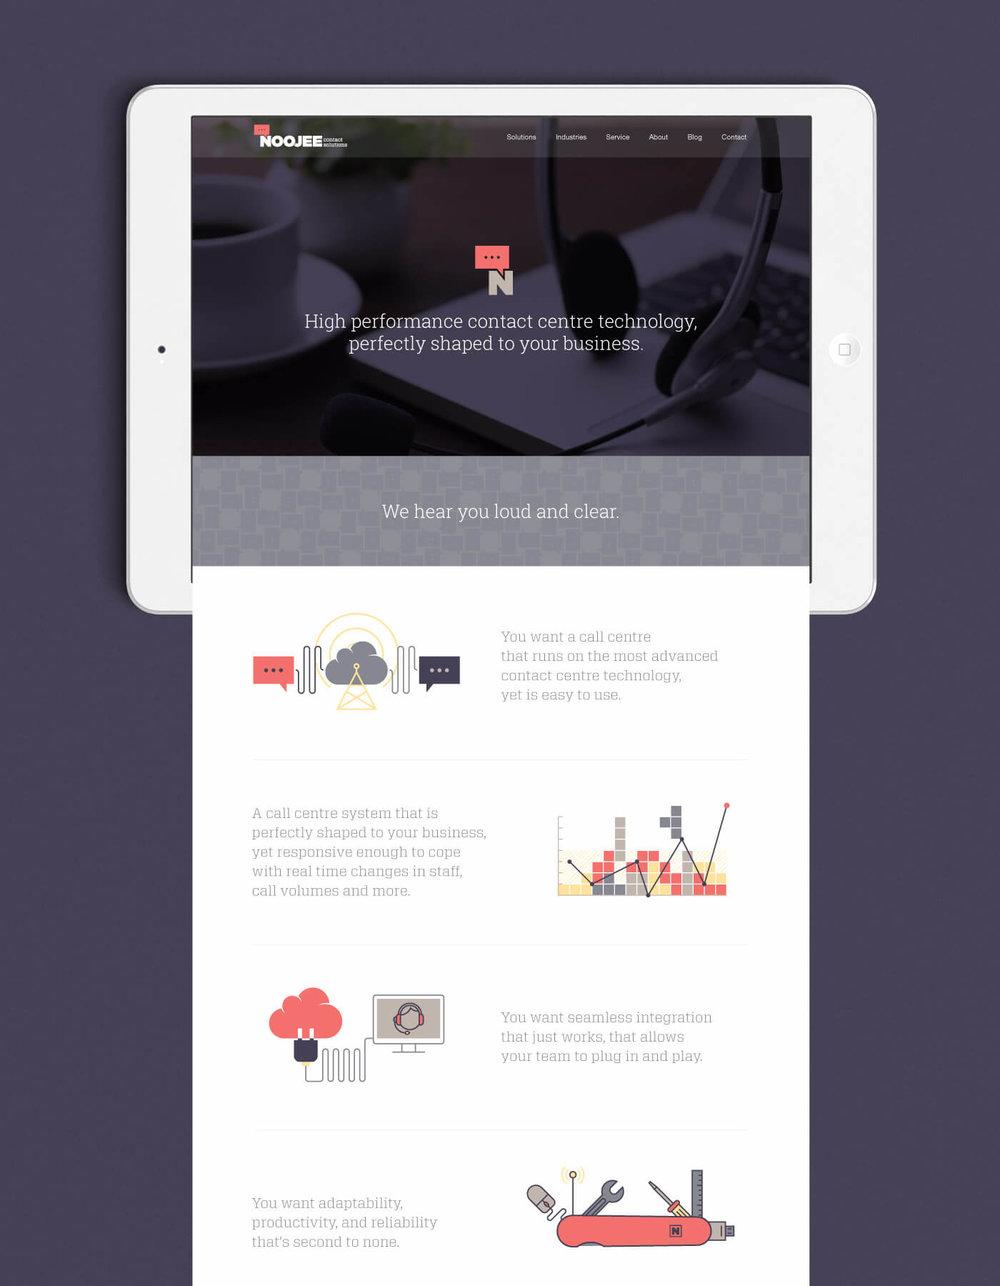 Noojee-home-page.jpg